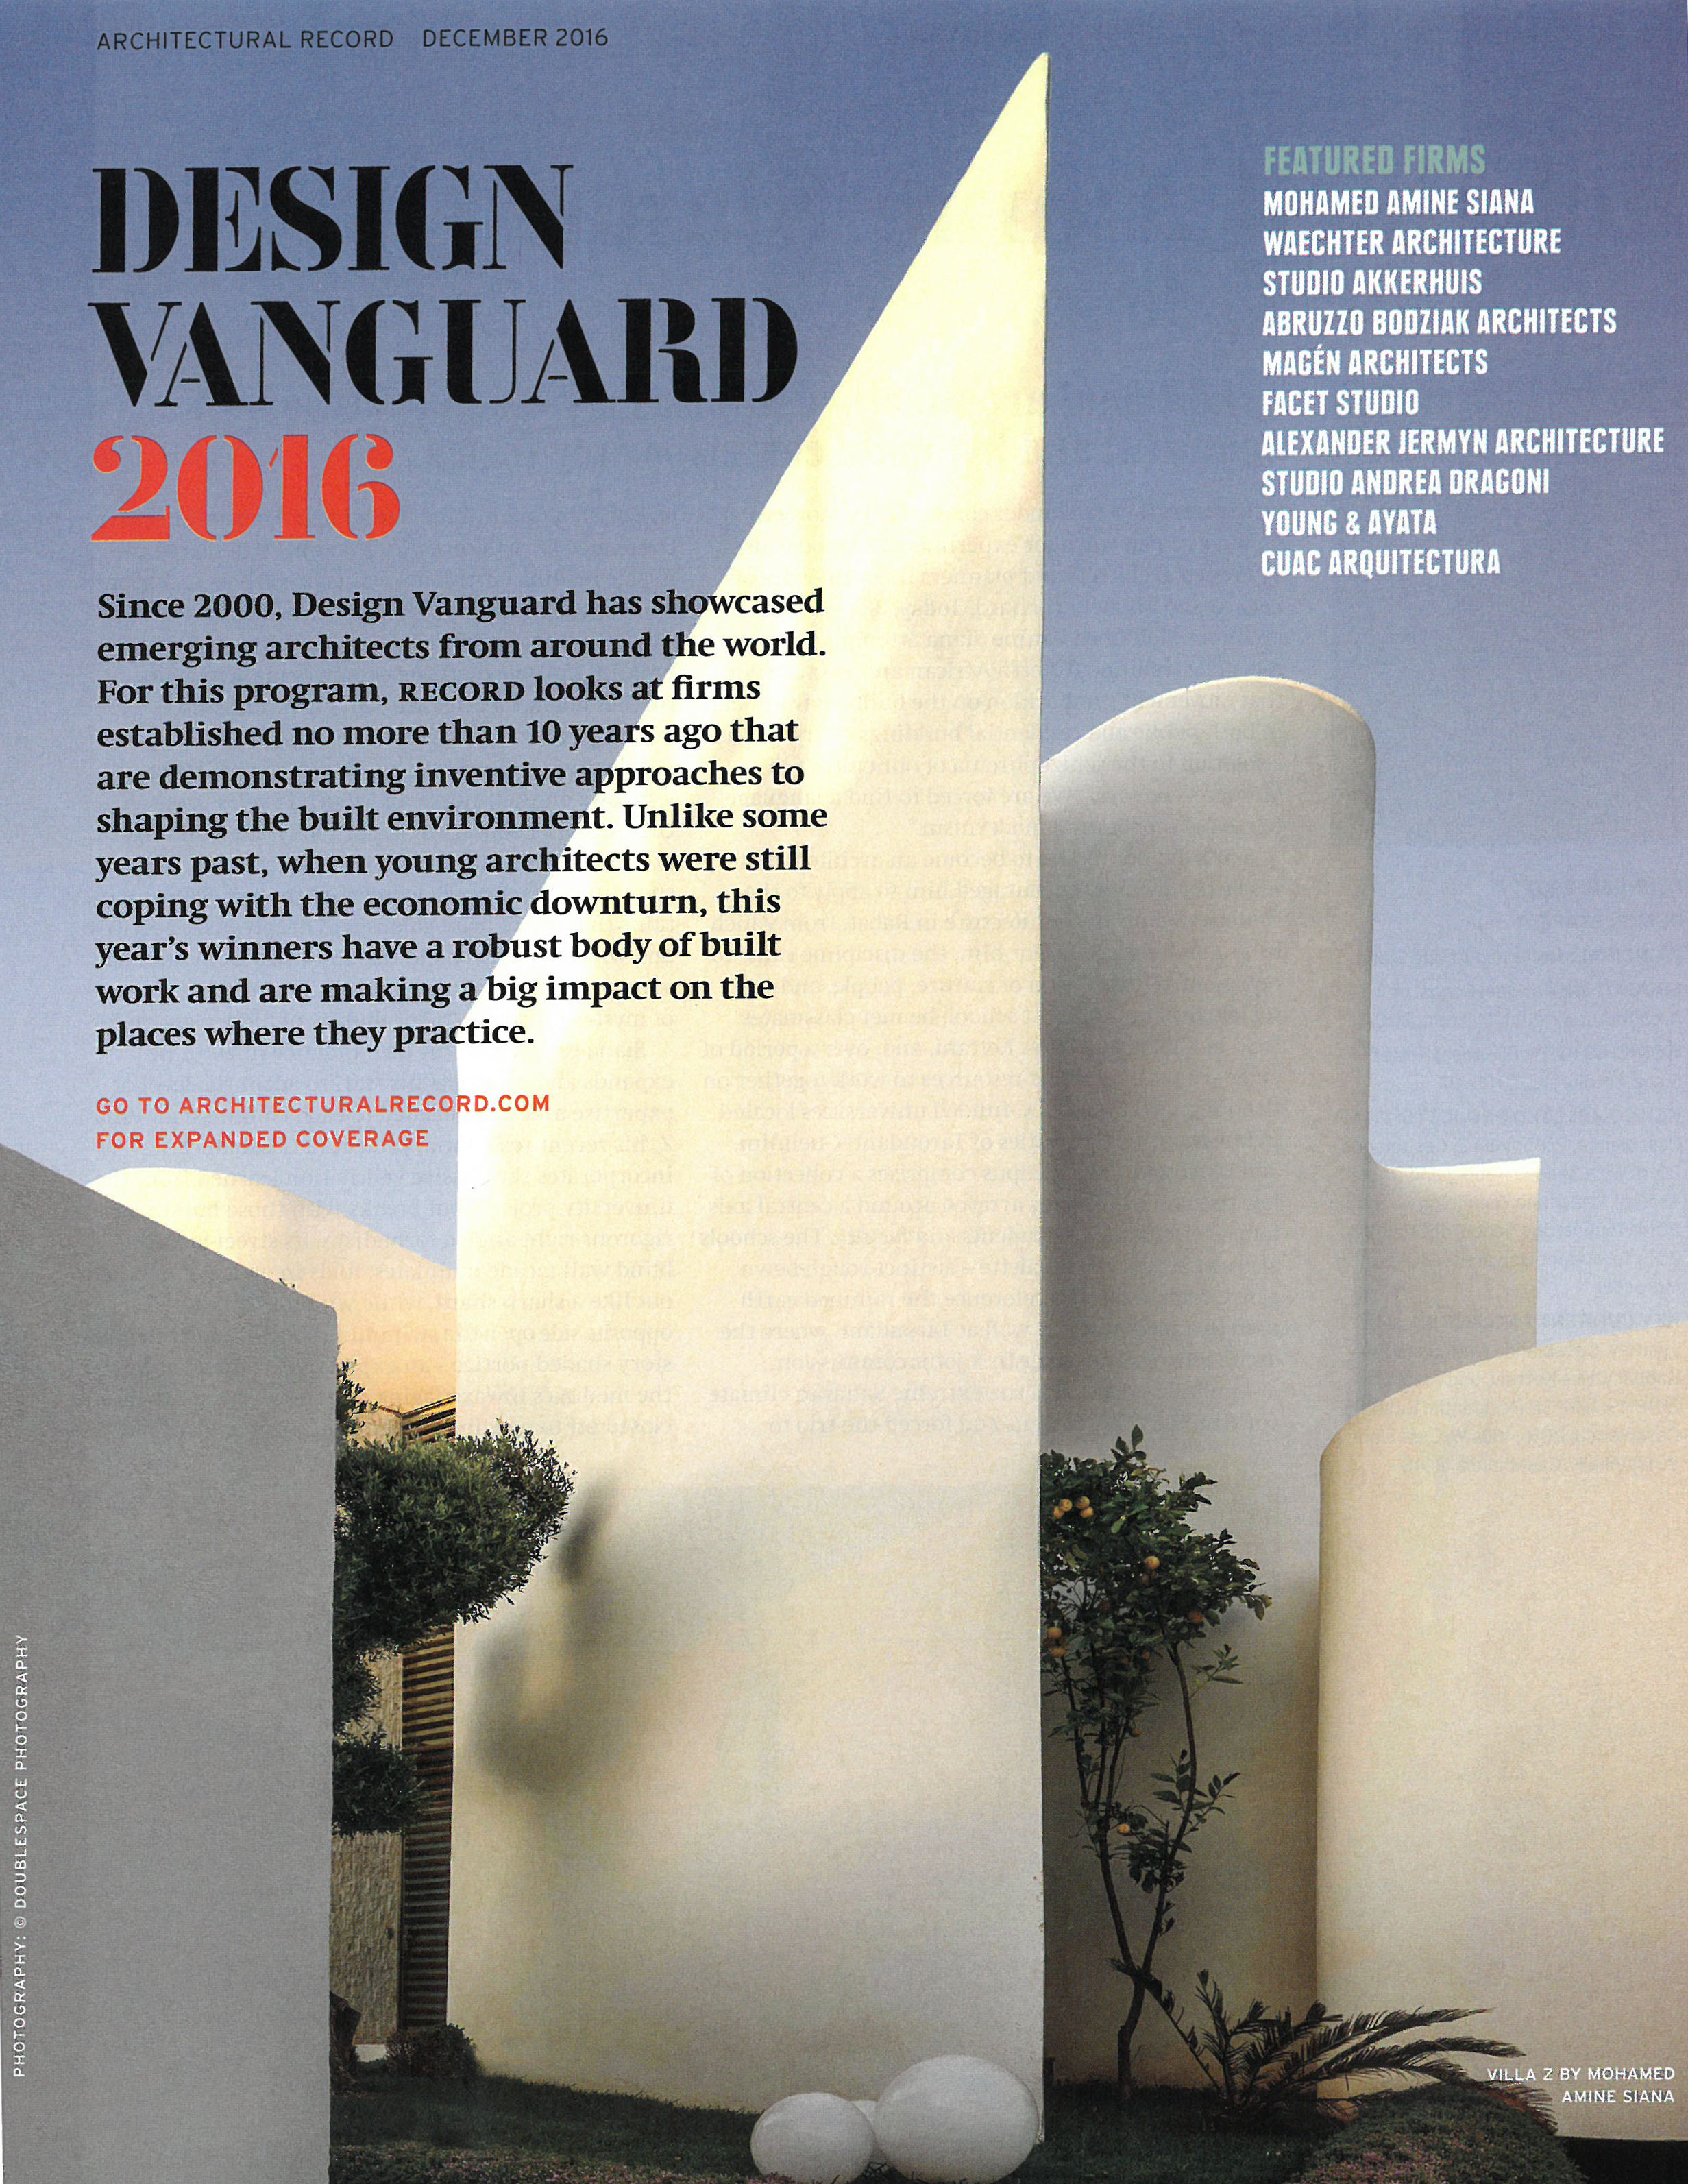 Arch Record Design Vanguard PG1.jpg